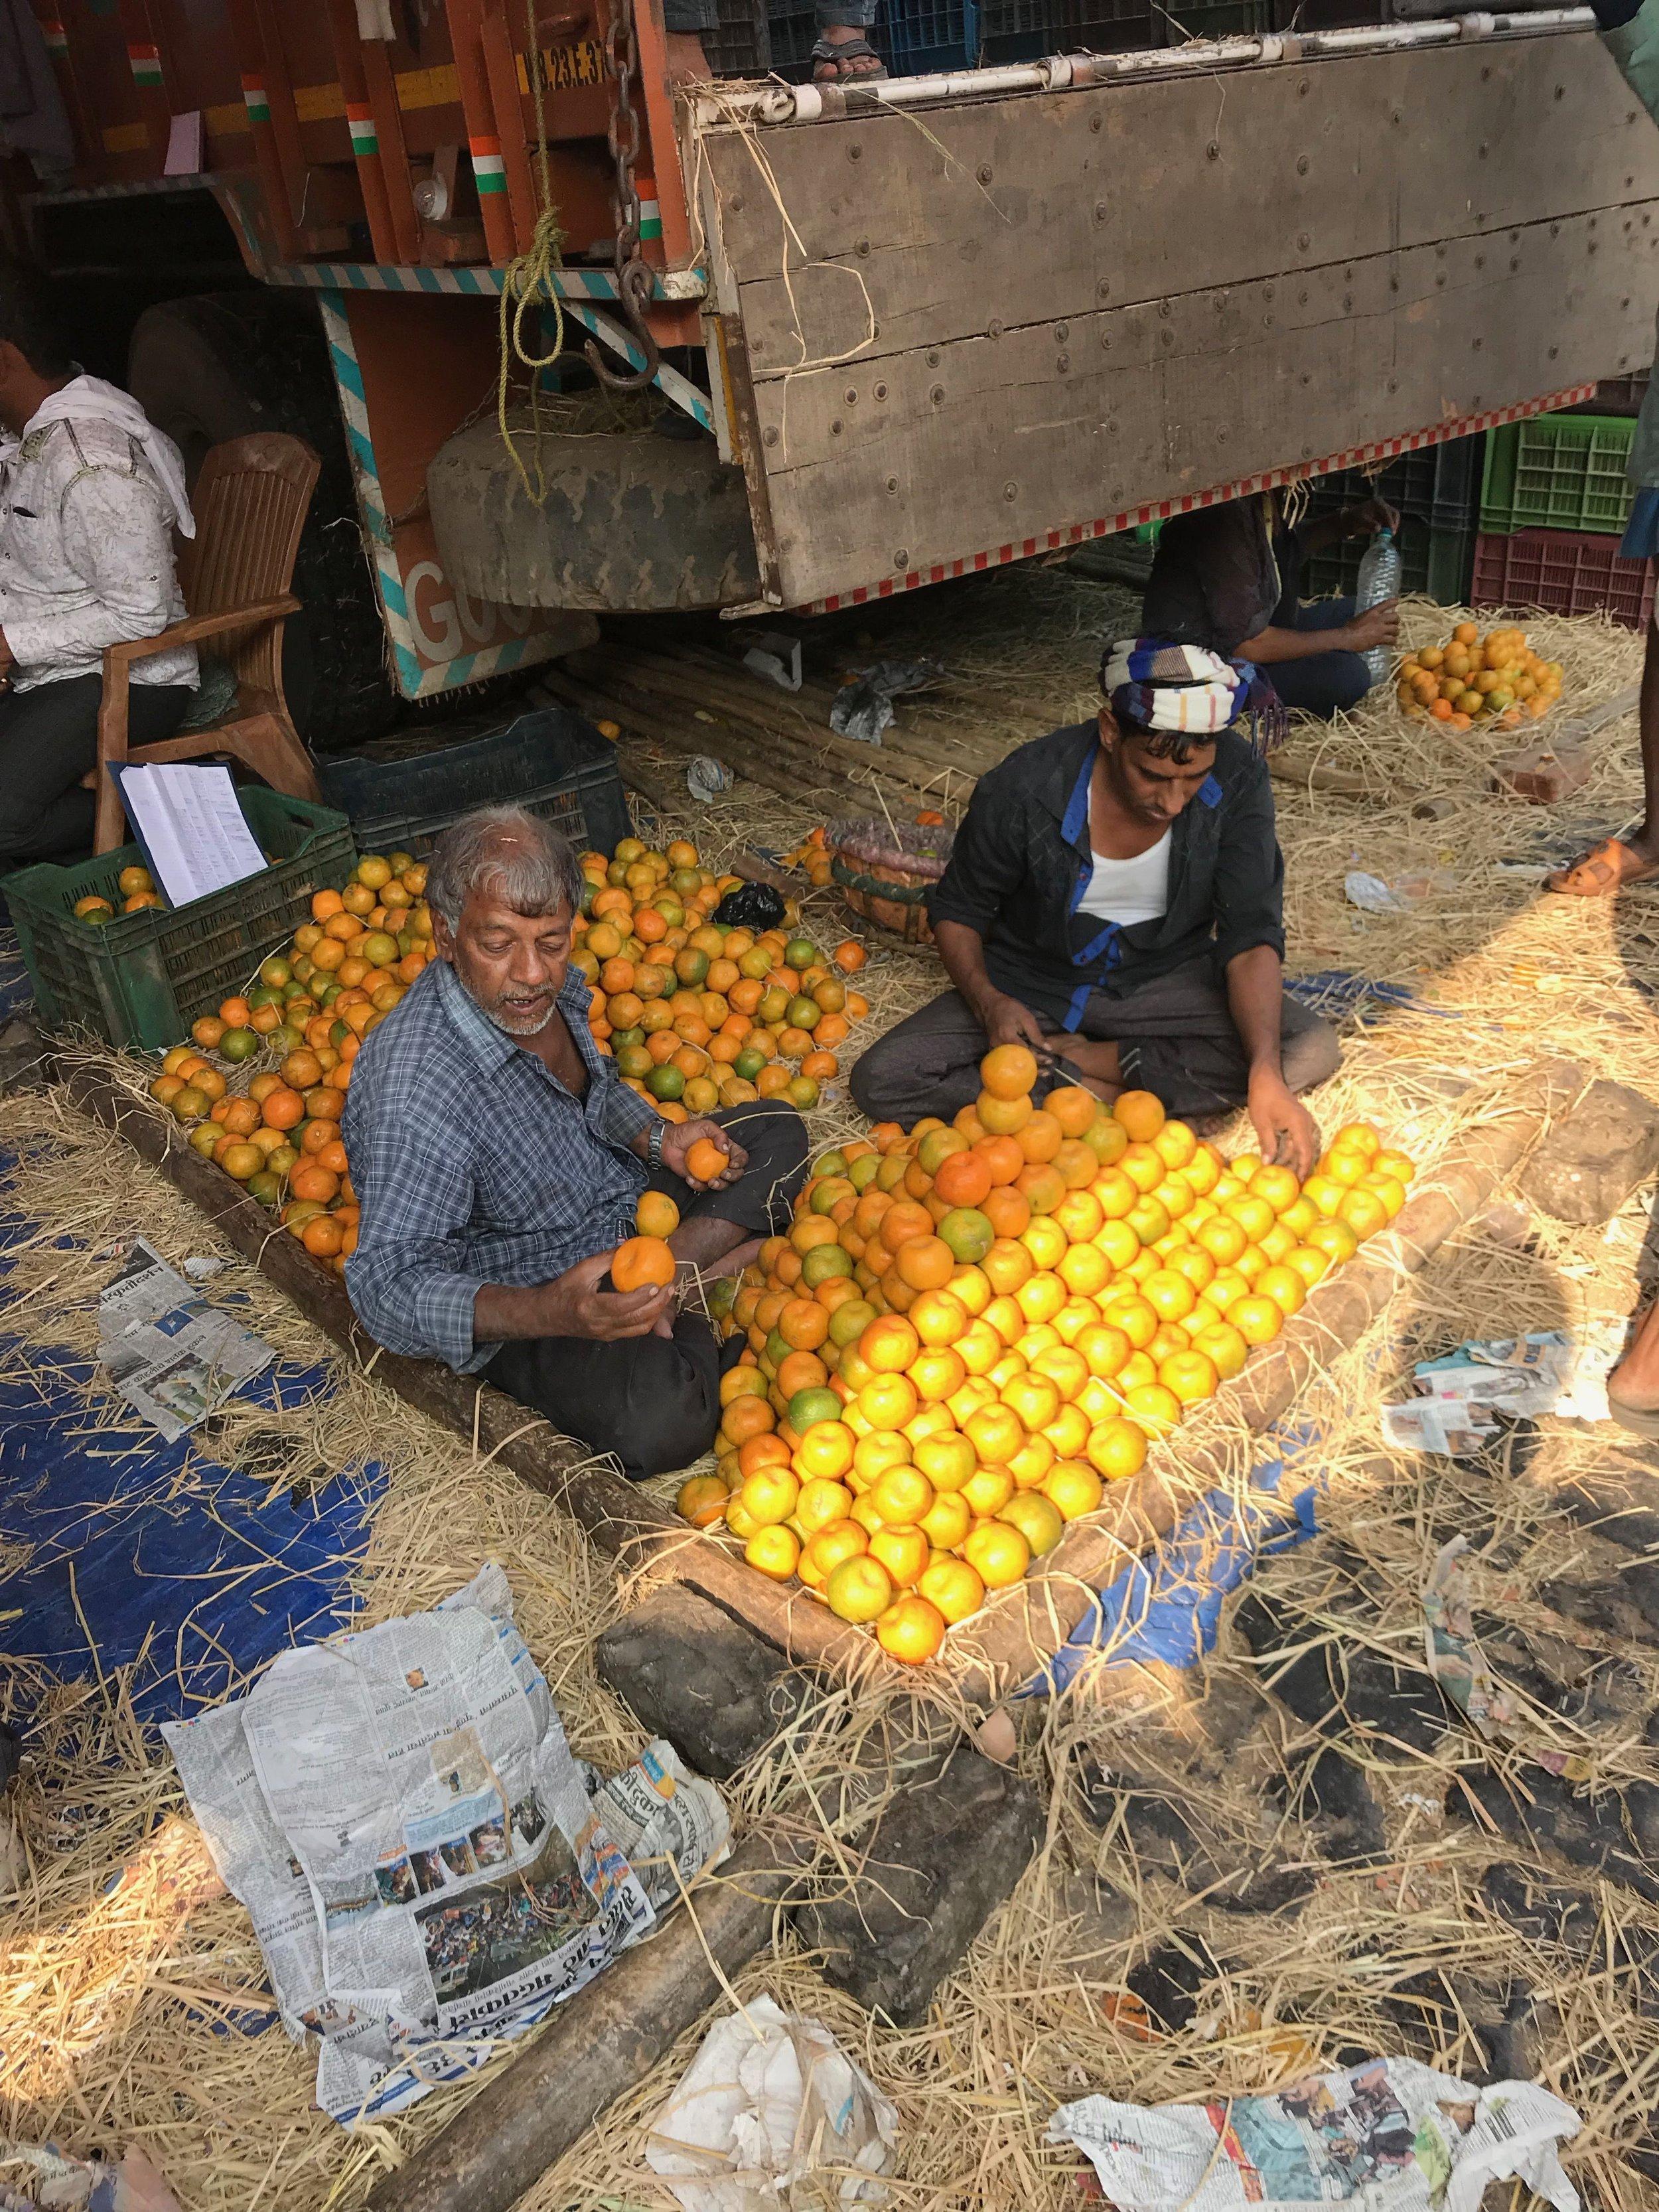 Calcutta (11 au 13 décembre)_9.jpg